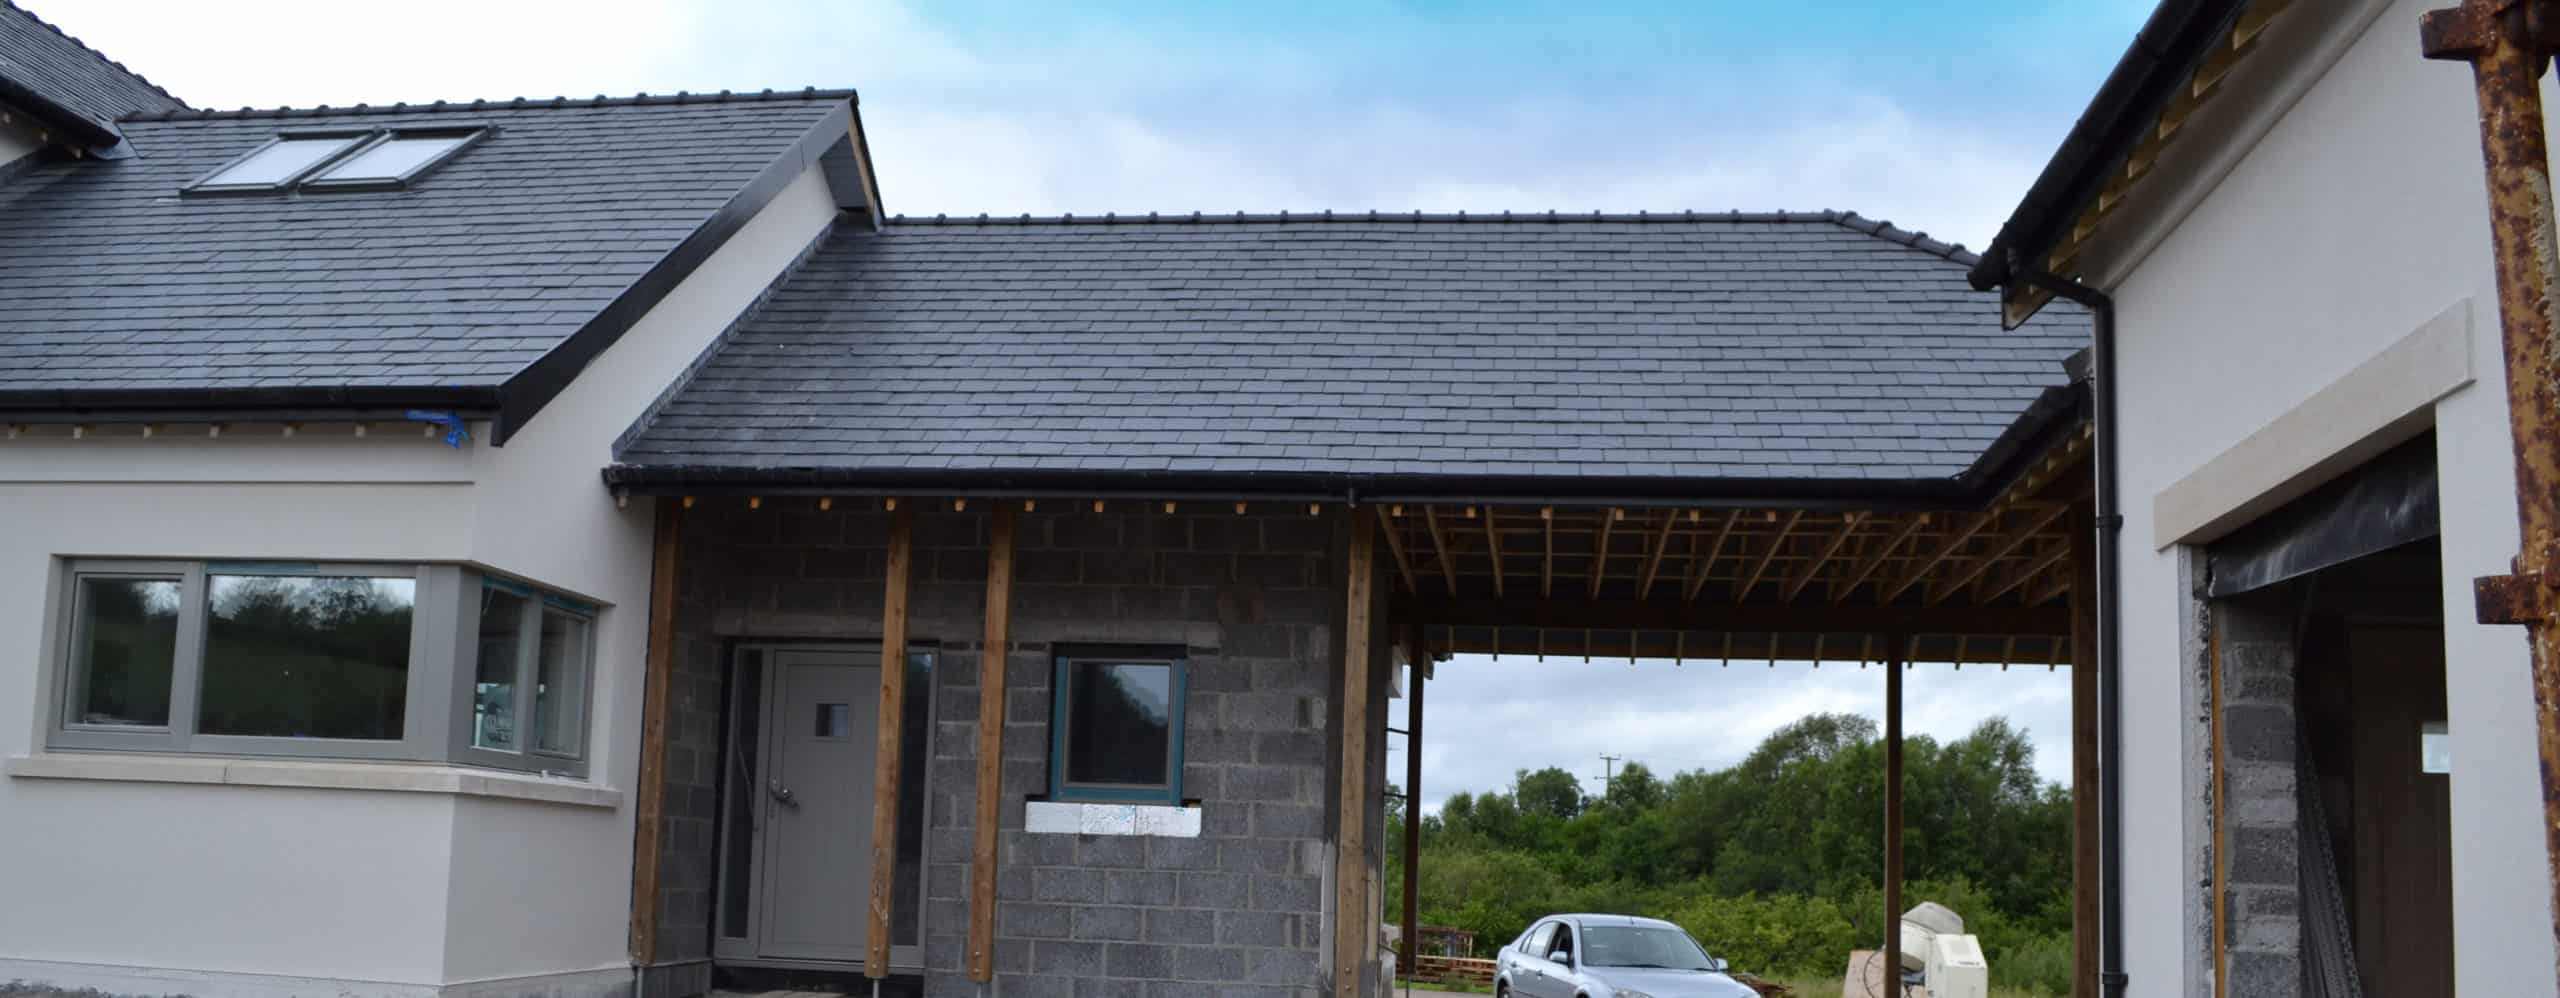 Timoney Dwelling - Under Construction